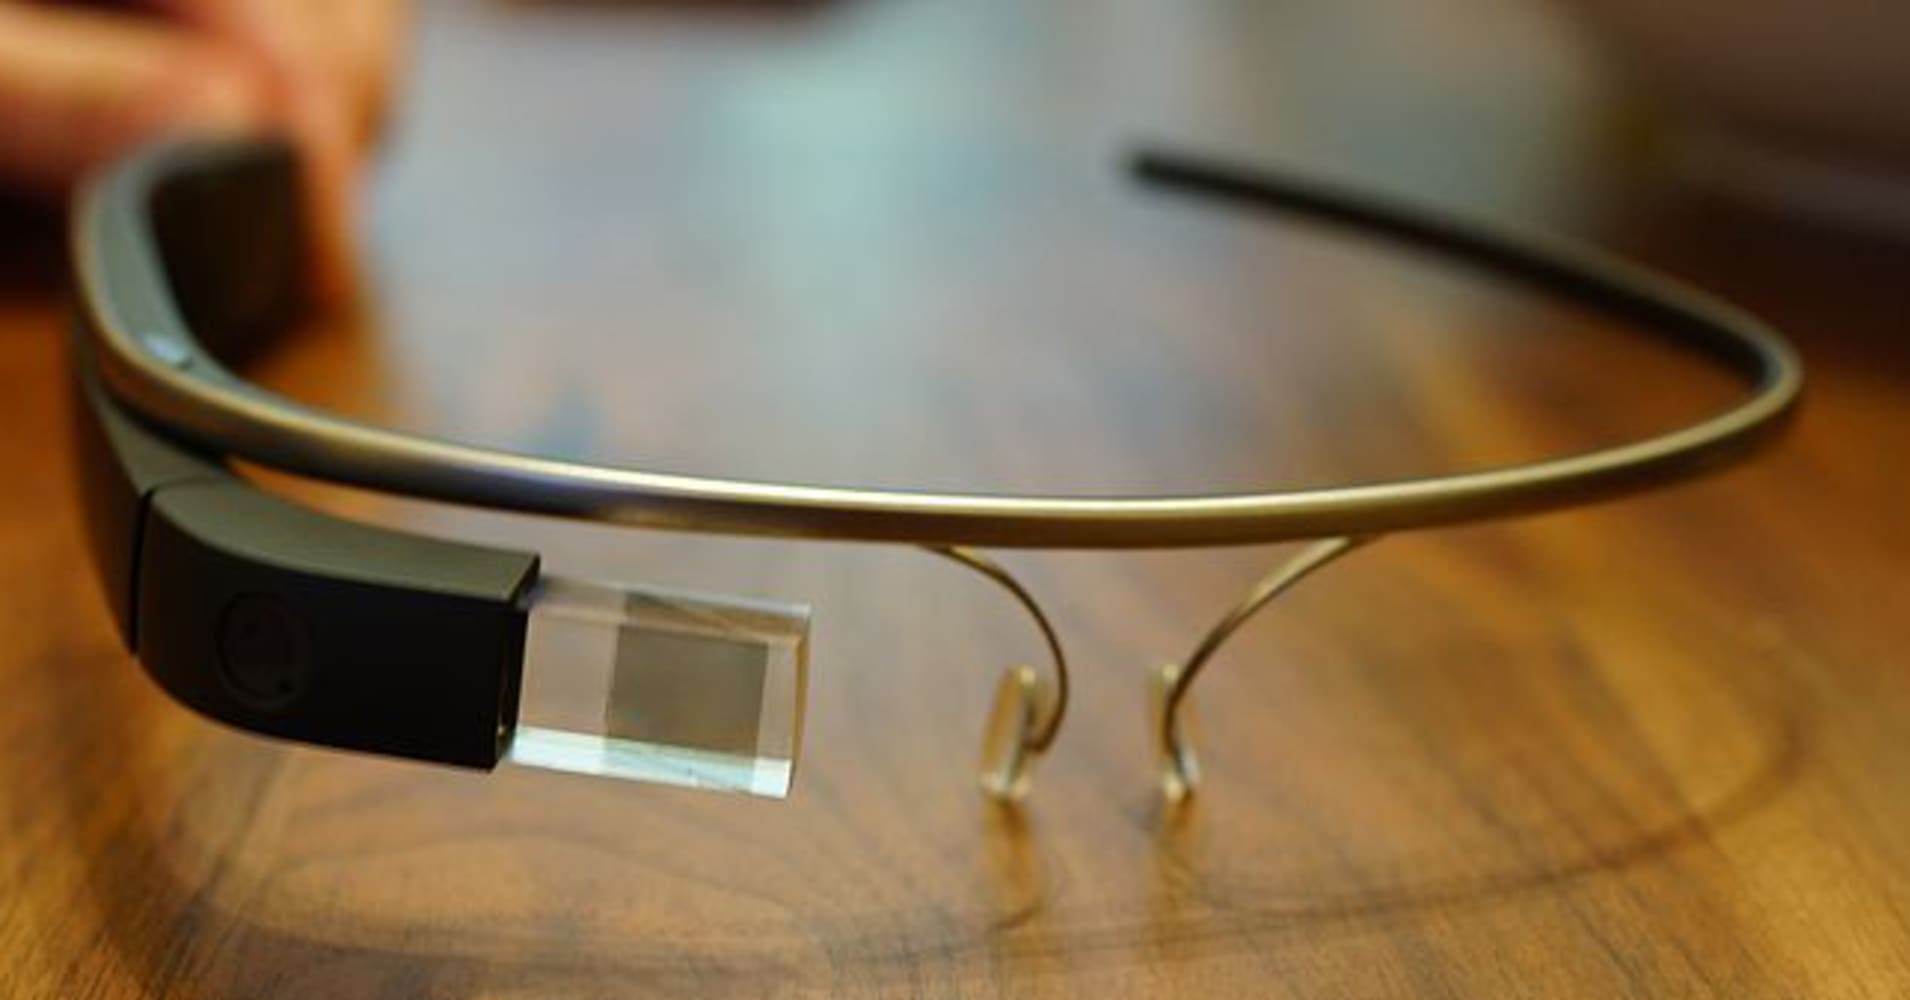 Google Glass head moves to Amazon